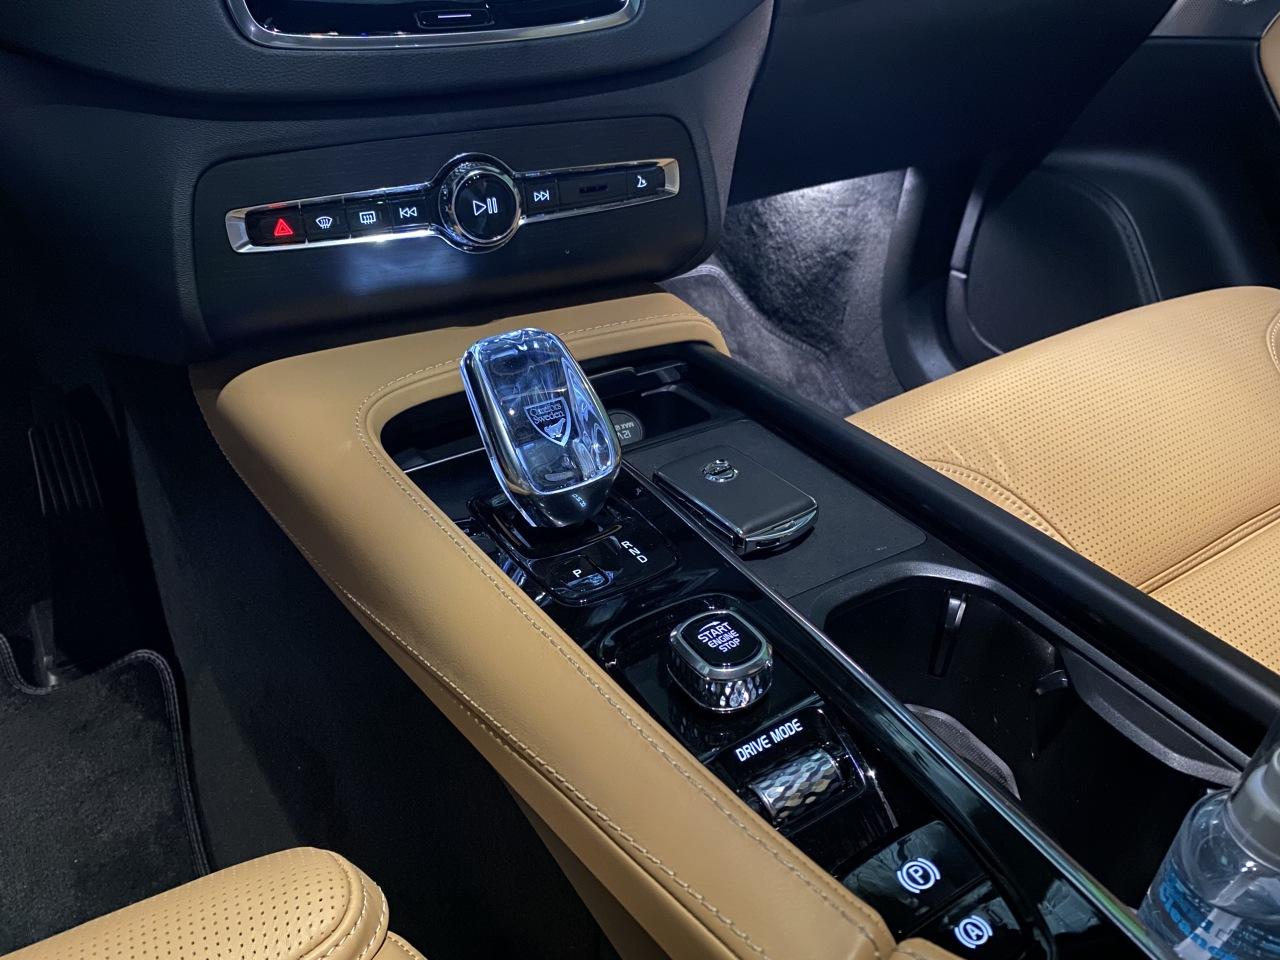 Volvo XC90 B6 (Jo He-rim/The Korea Herald)